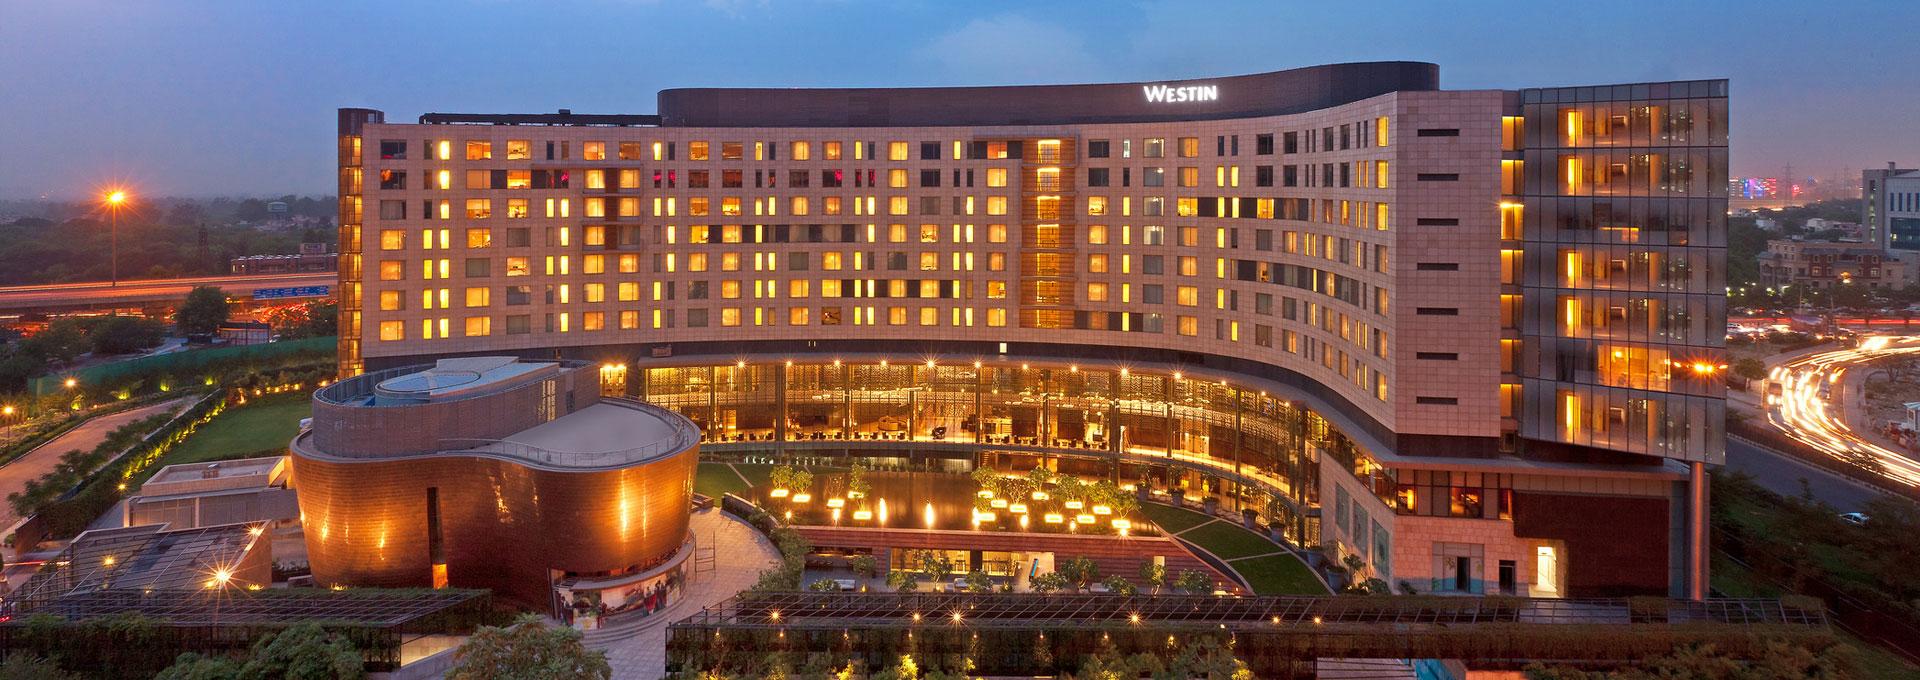 Westin  Gurgaon